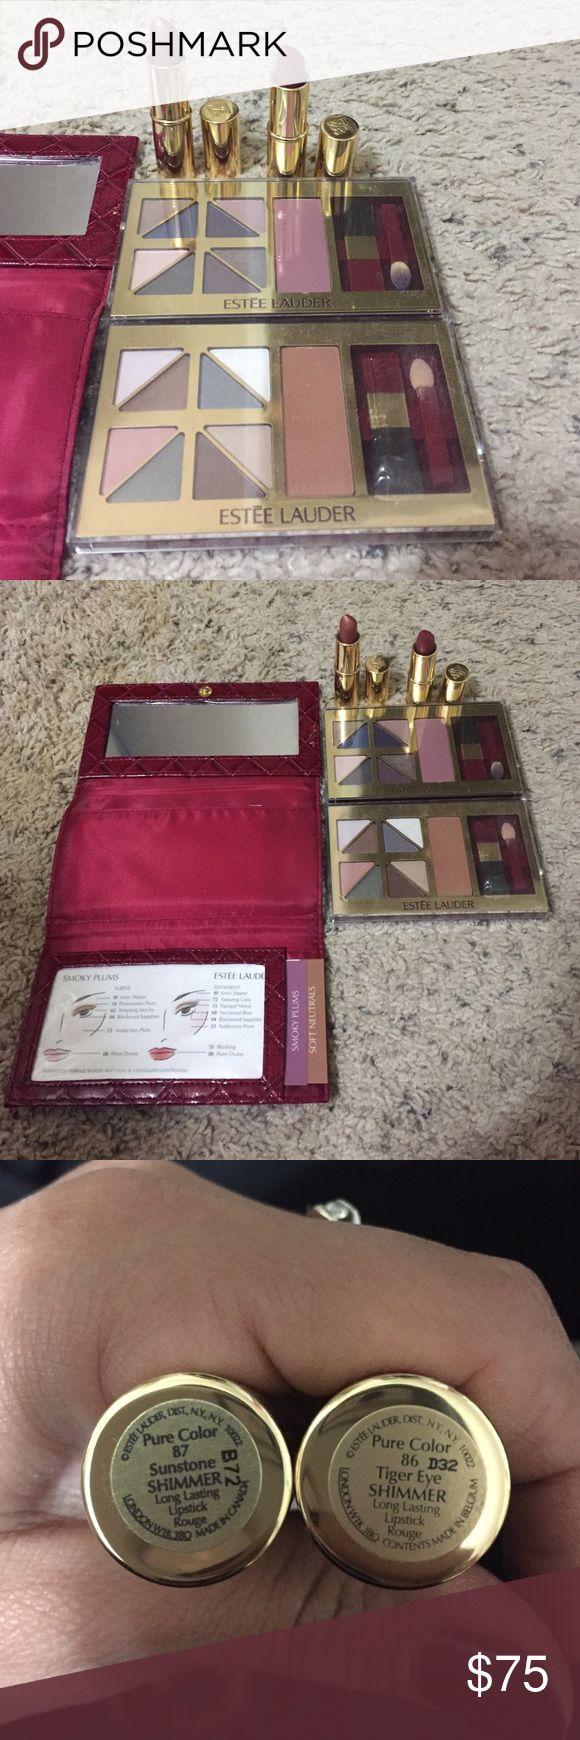 Estée Lauder makeup set. Estée Lauder makeup set. Lipsticks are new. Eyeshadow like new, used once. Includes eyeshadow carry case with mirror. Estee Lauder Makeup